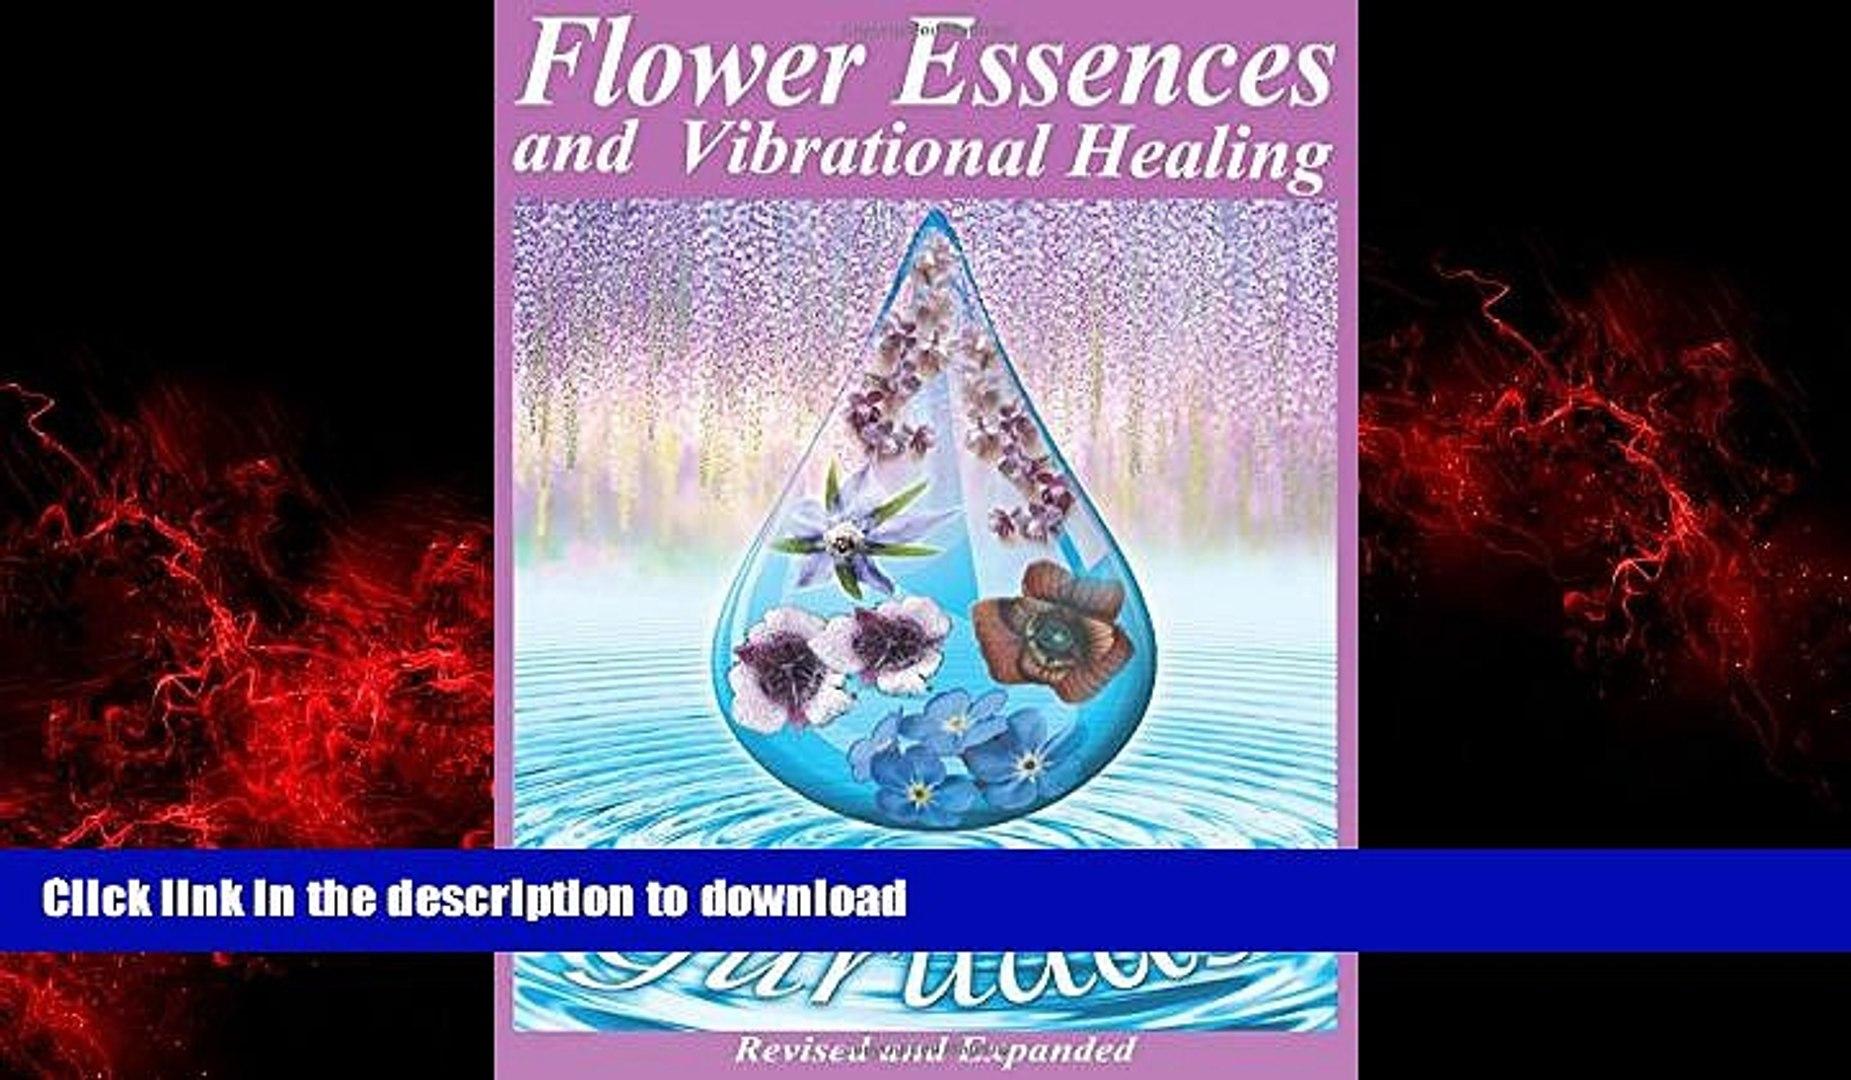 Flower Essences and Vibrational Healing